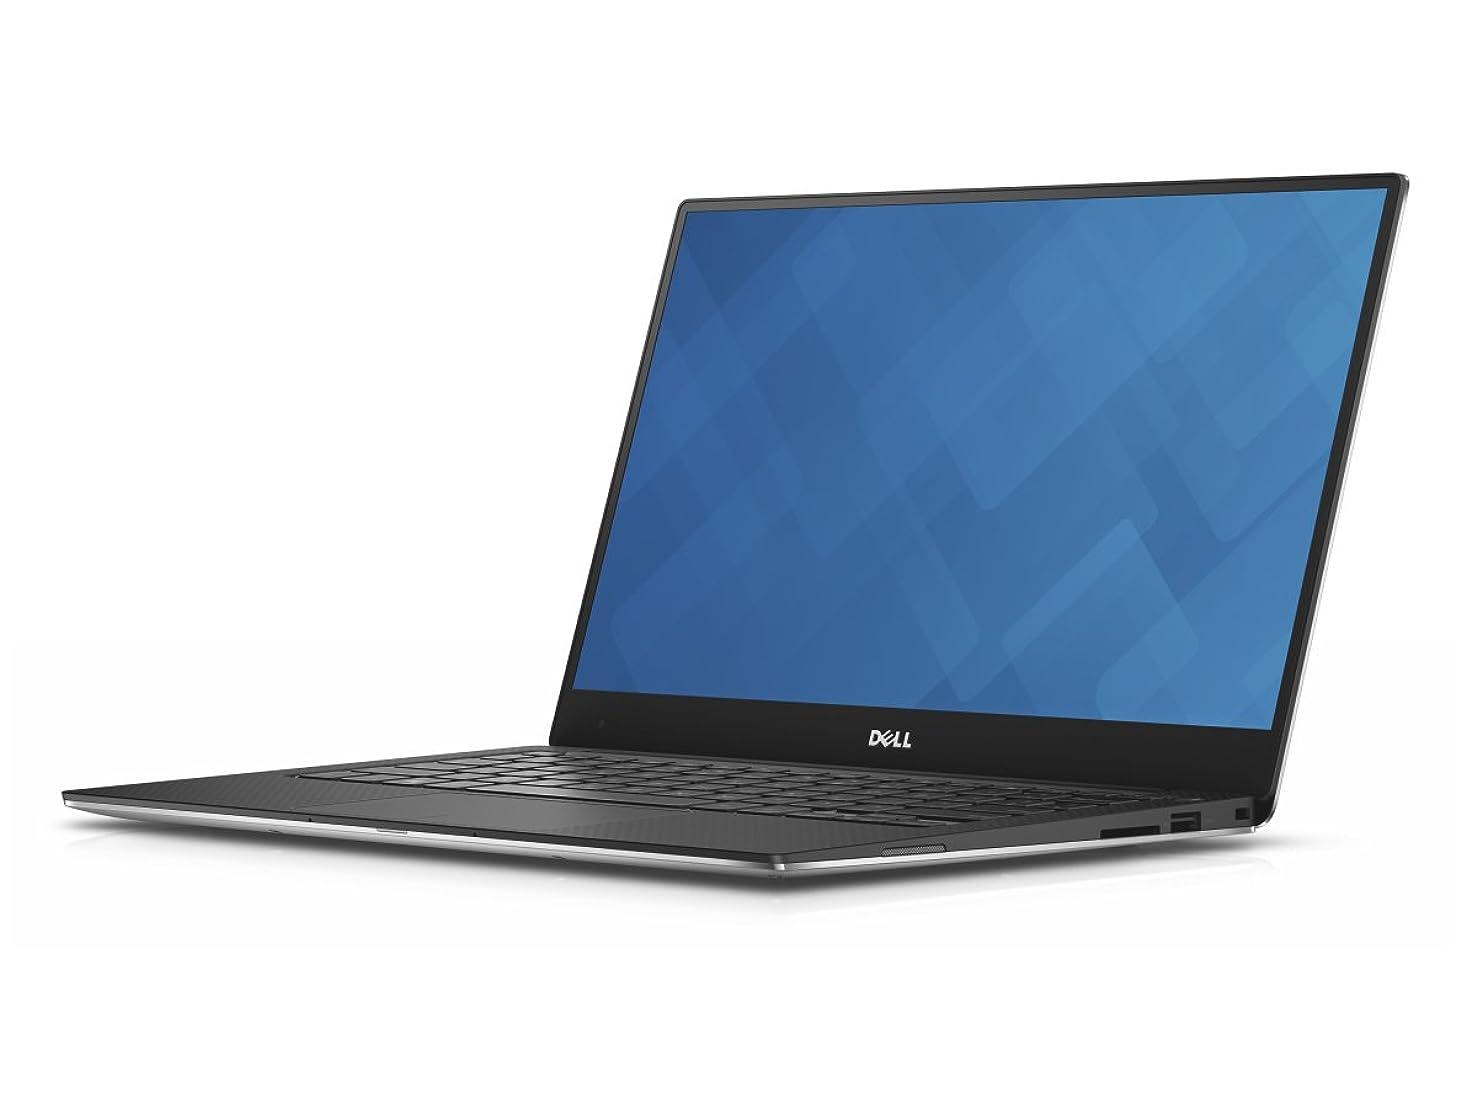 Dell XPS13-9343 13.3-Inch Ultrabook (5th Gen Intel Core i5-5200U Processor 2.2GHz, 8GB DDR3, 256GB SSD, Windows 8.1) (Certified Refurbished)